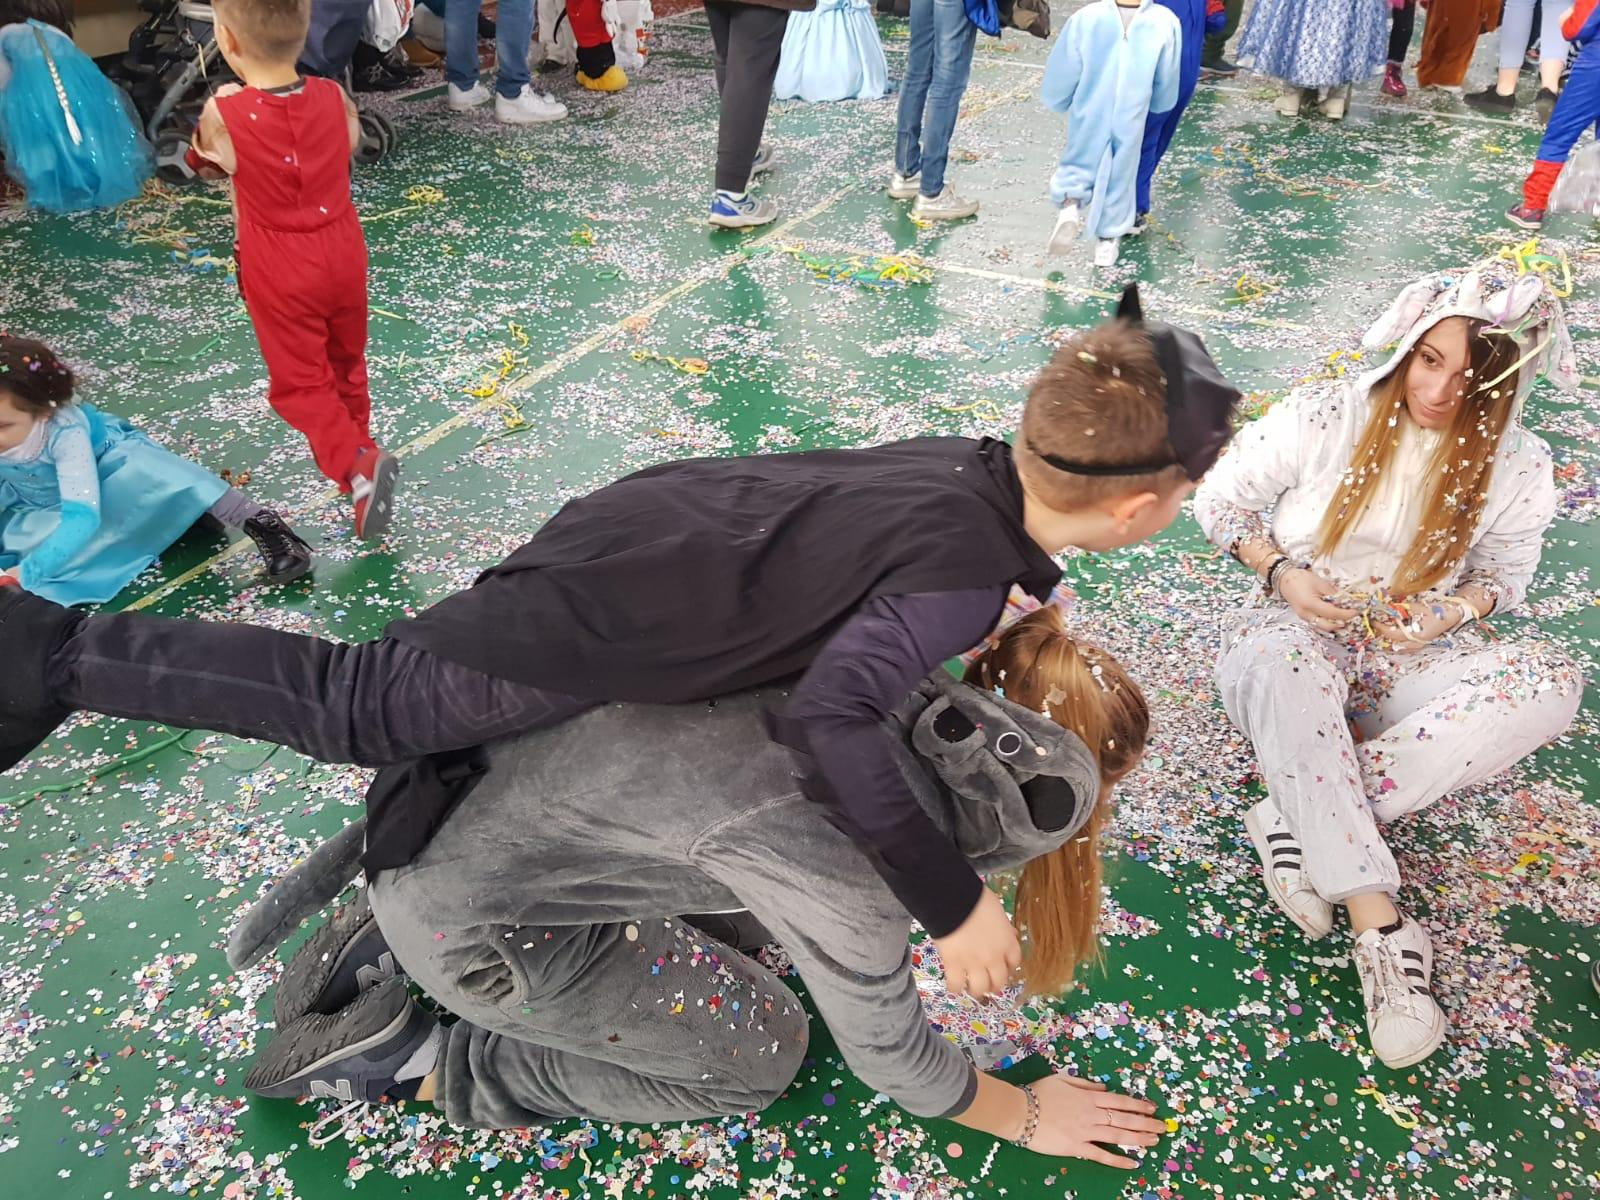 Baraonda Carnevale 2019 (11)